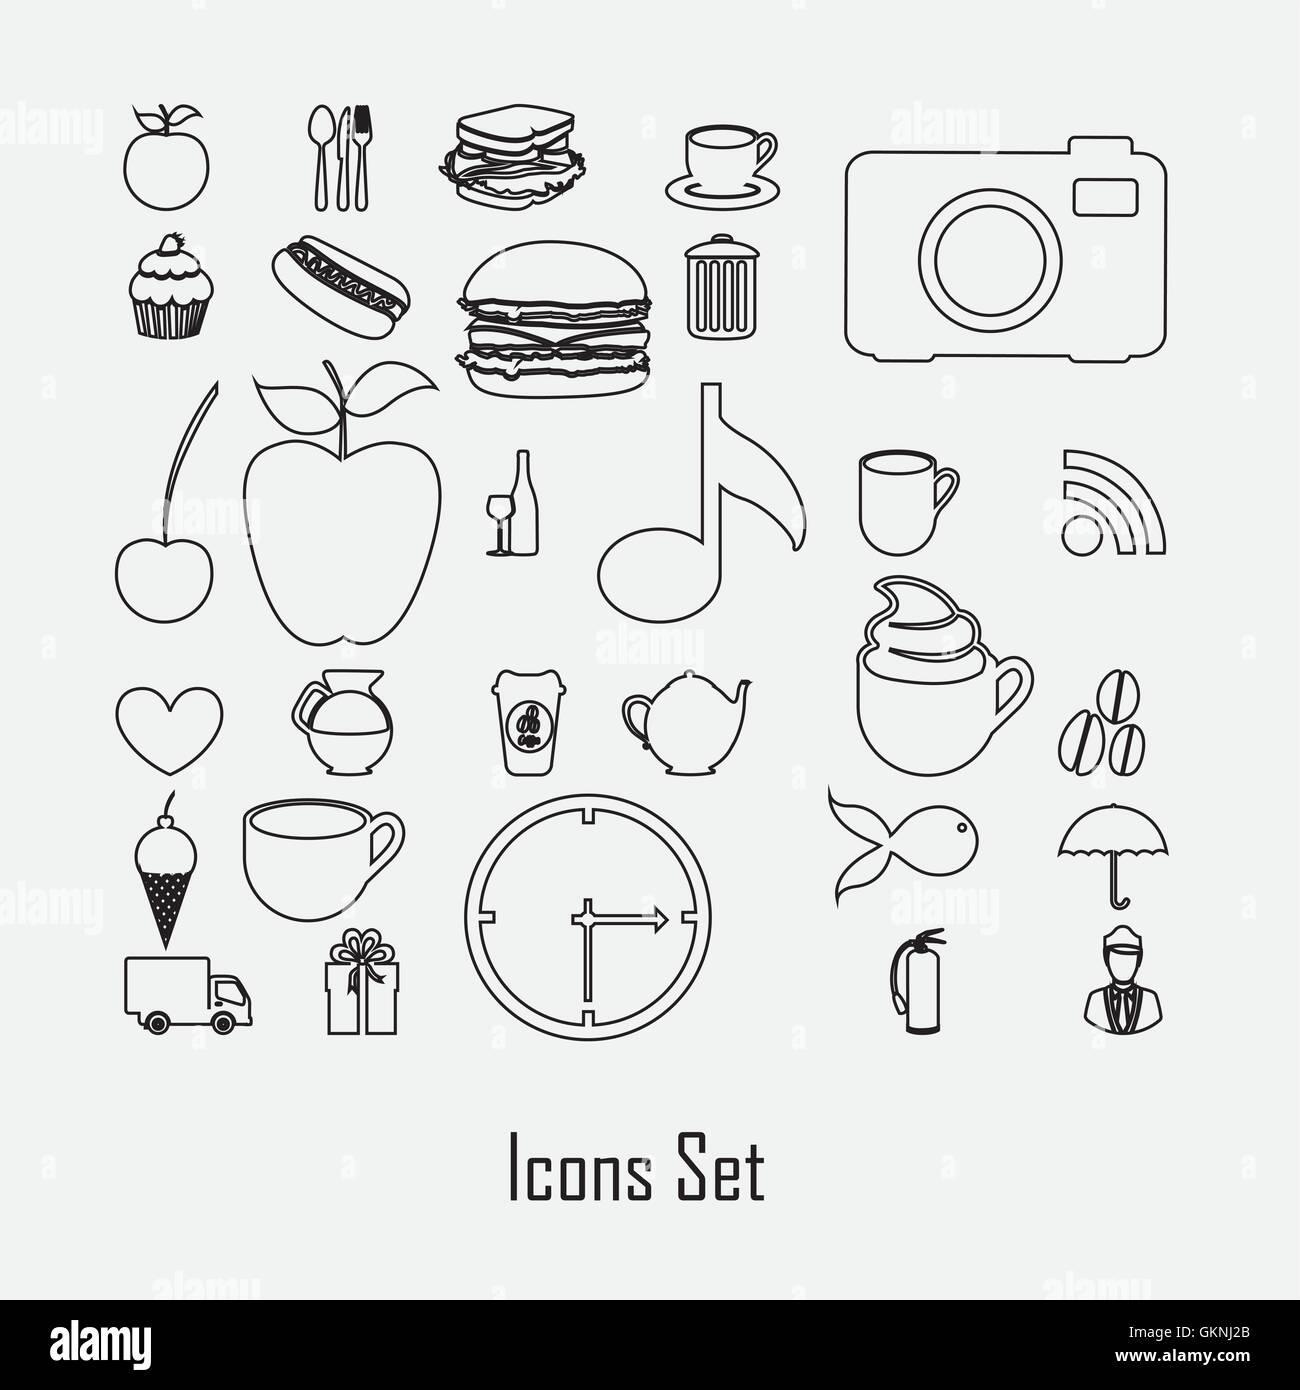 Icon silhouettes - Stock Vector